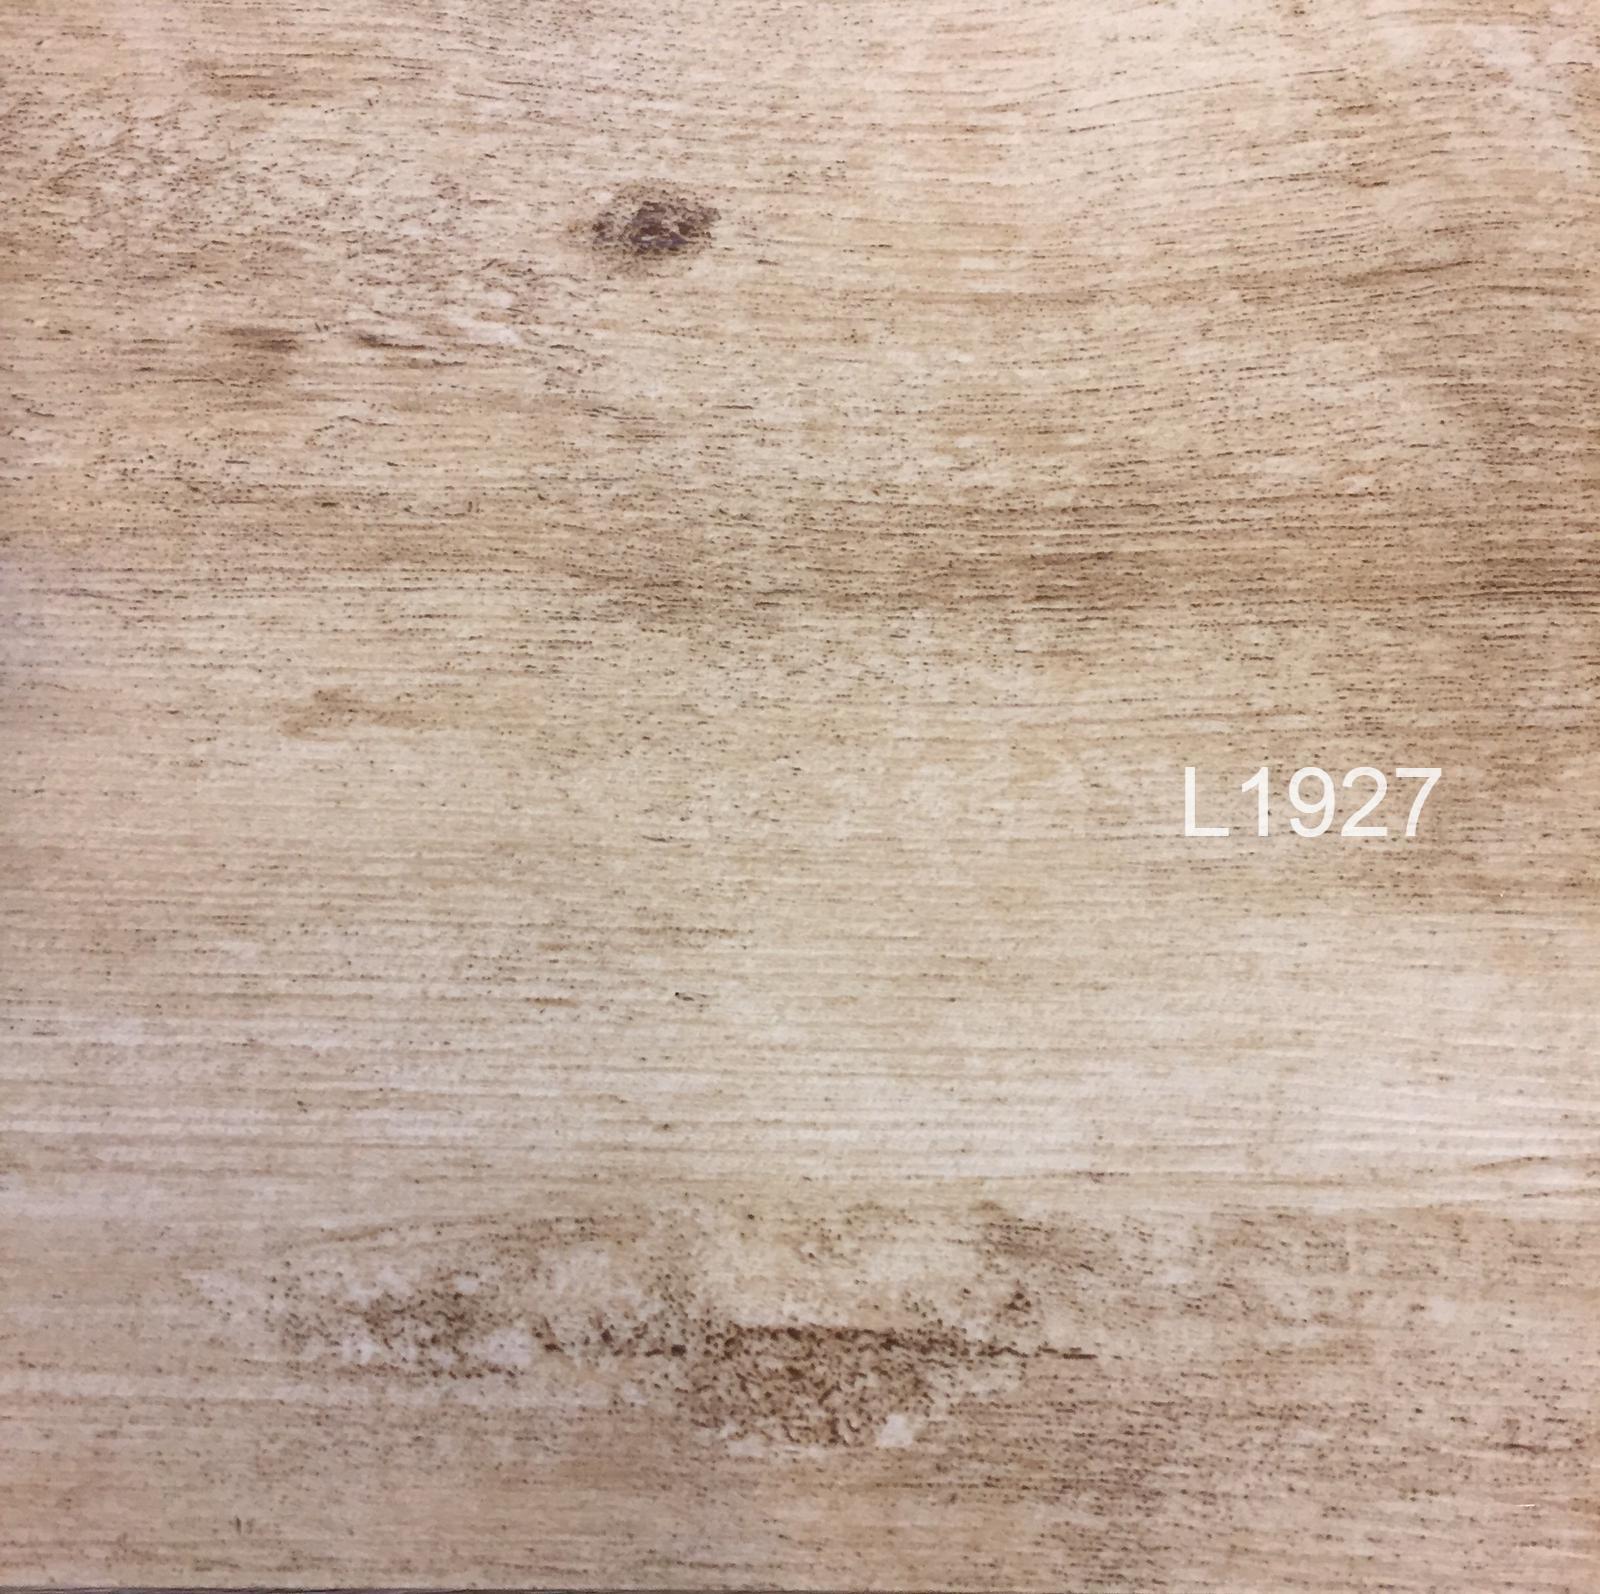 L1927